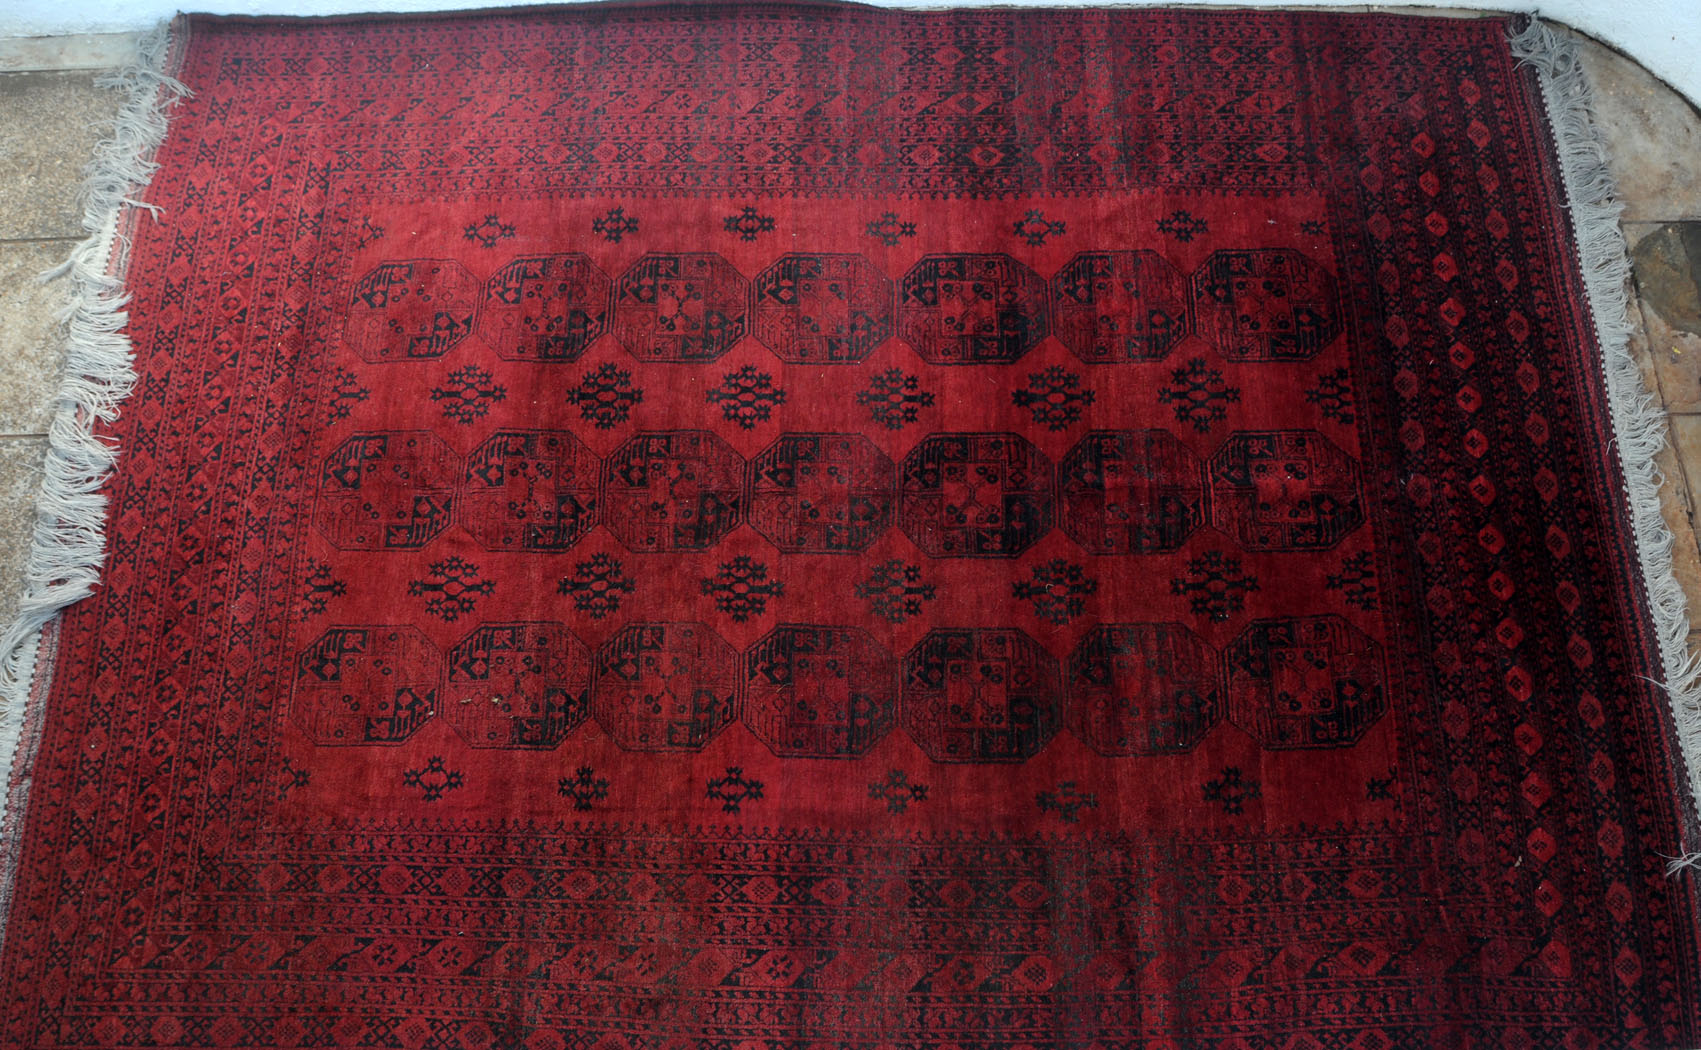 725 A Remarkable Old Afghan Ersari Carpet Www Bagface Co Uk